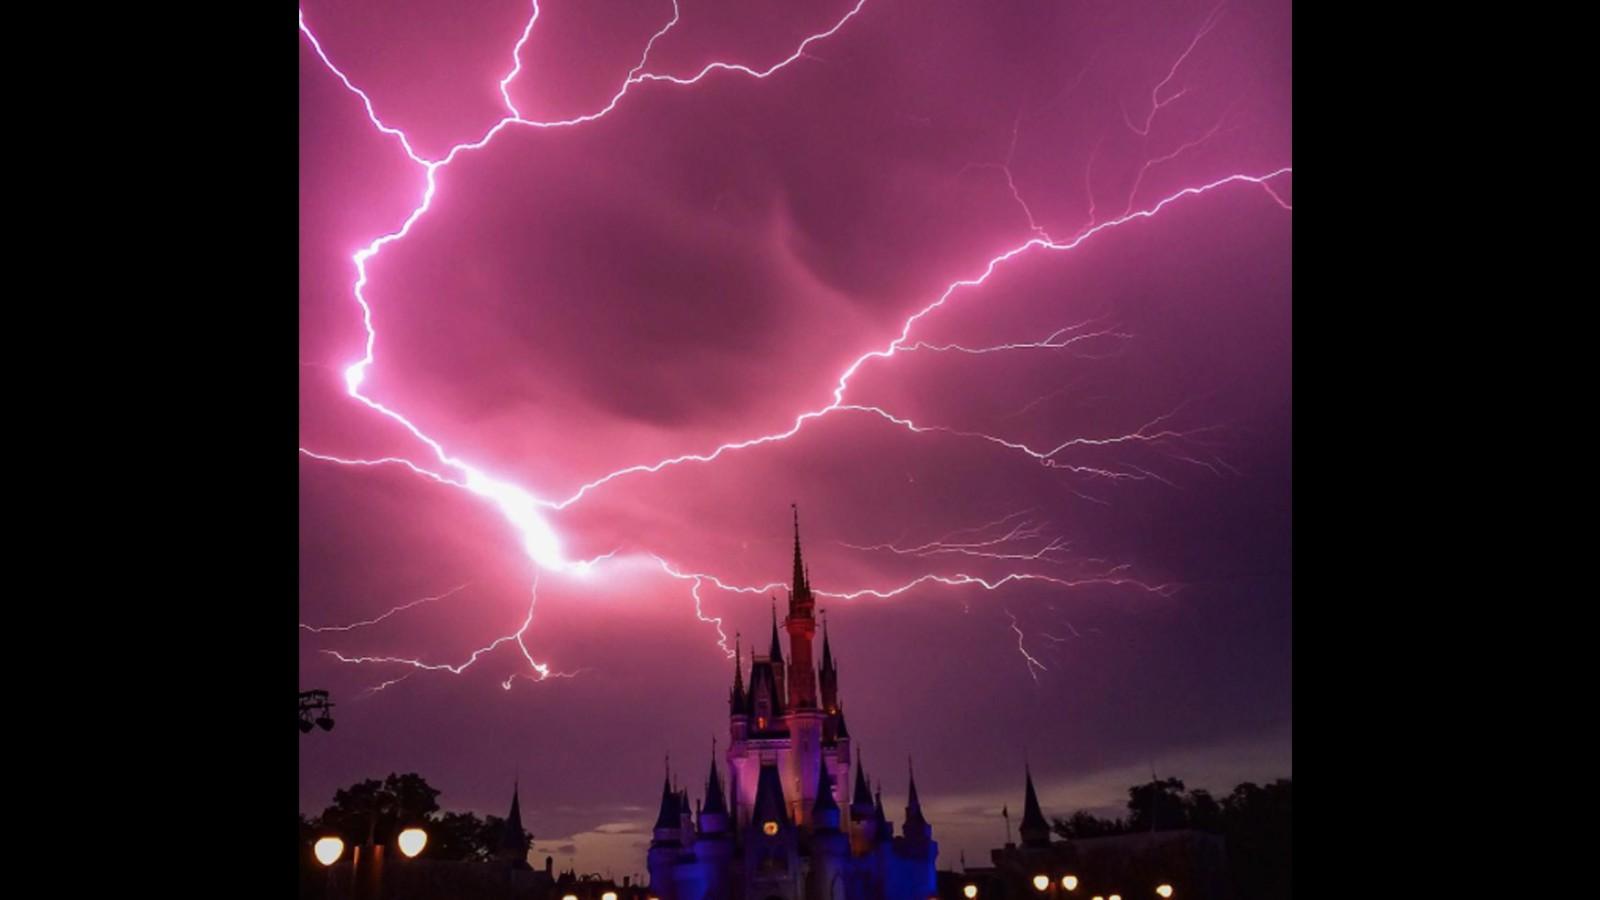 Cnn Empire State Building Lightning